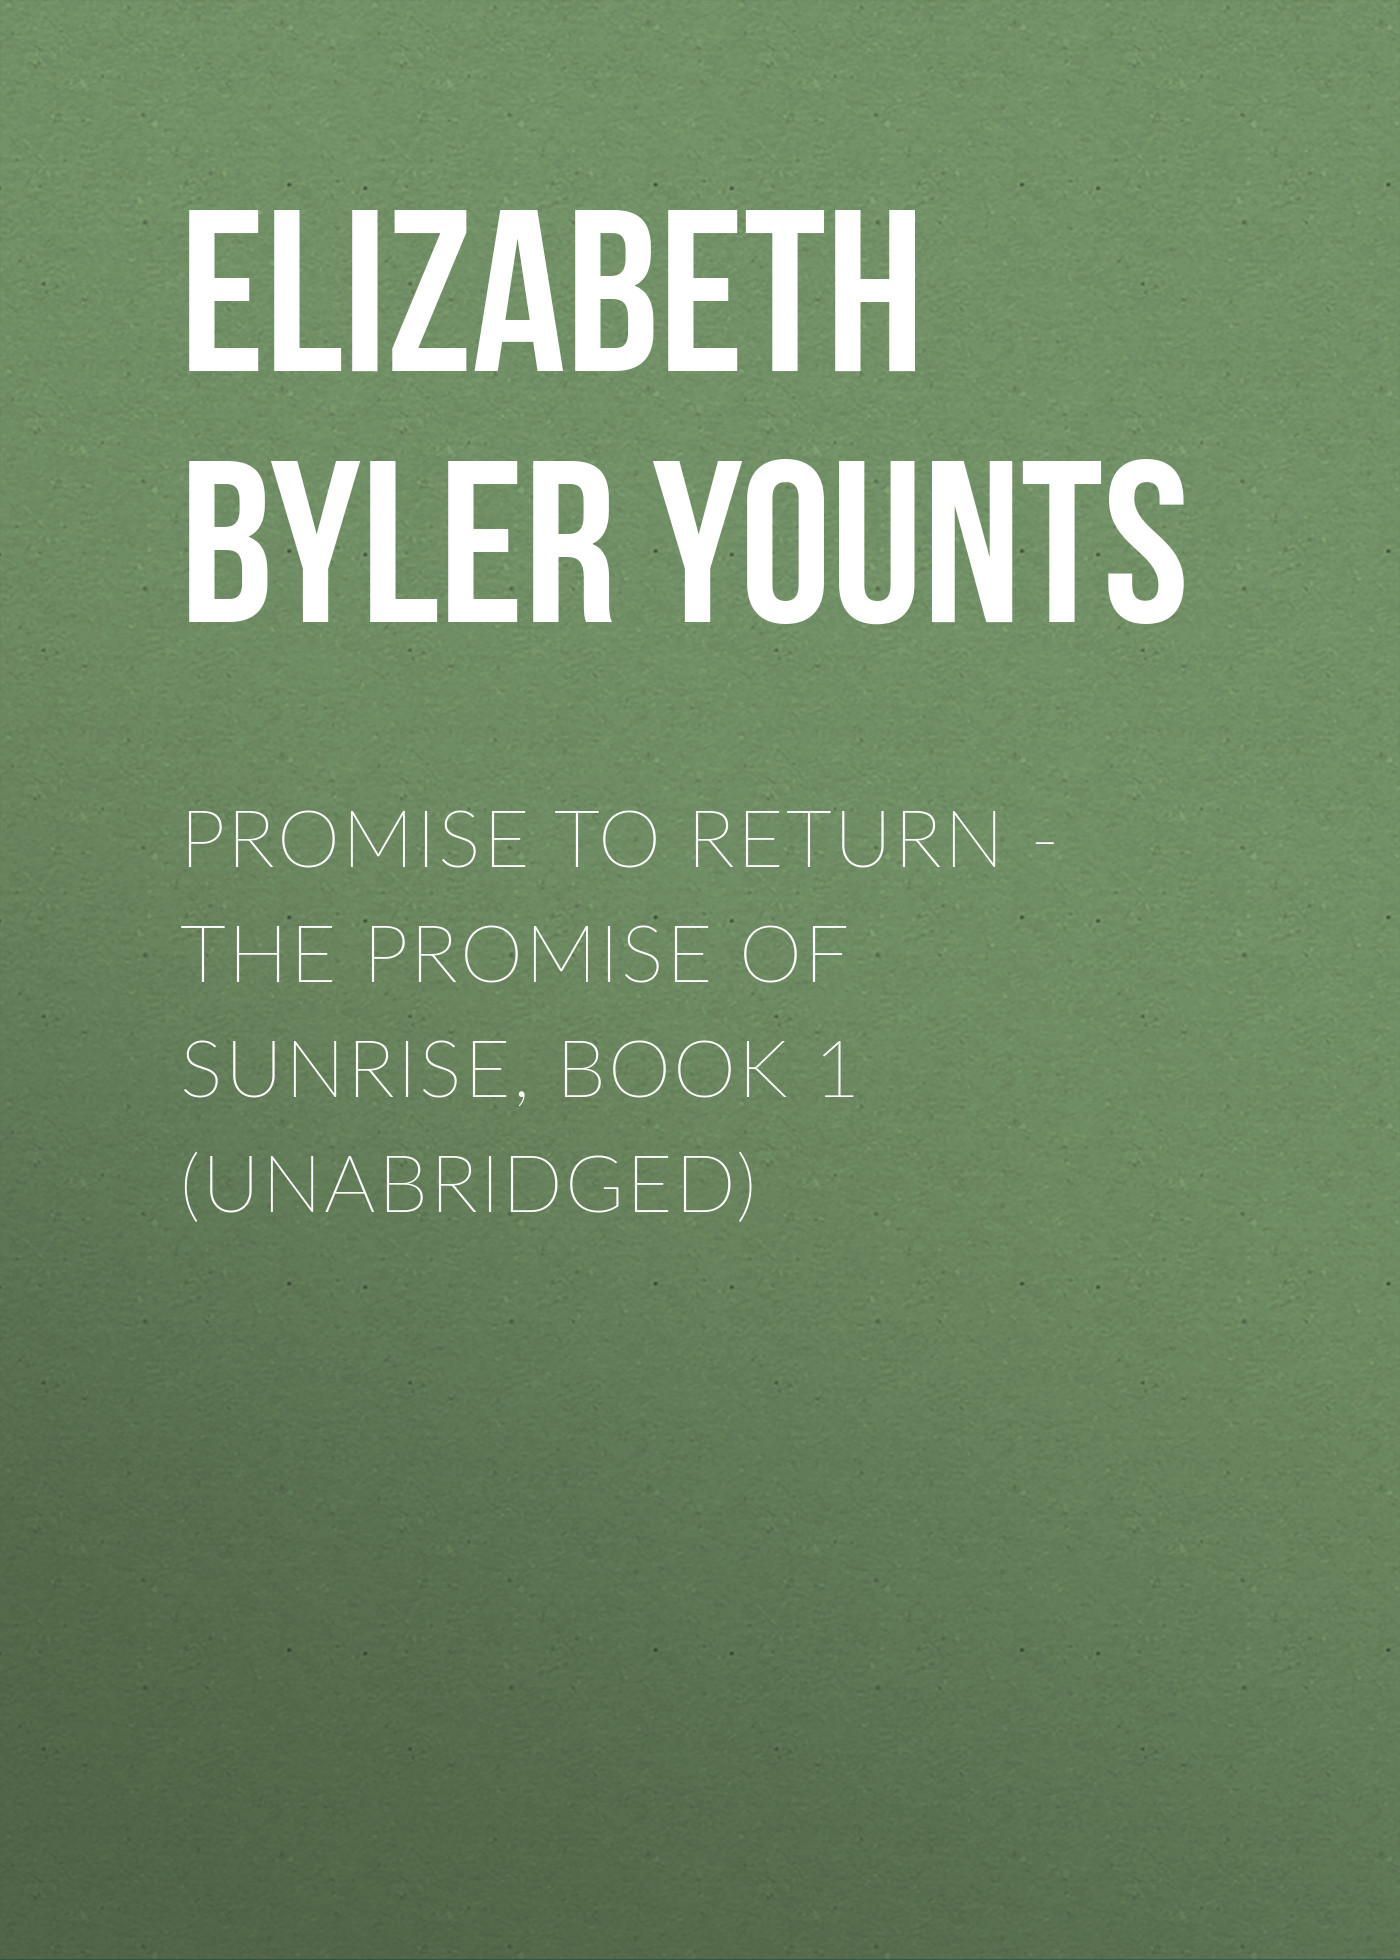 Elizabeth Byler Younts Promise to Return - The Promise of Sunrise, Book 1 (Unabridged)